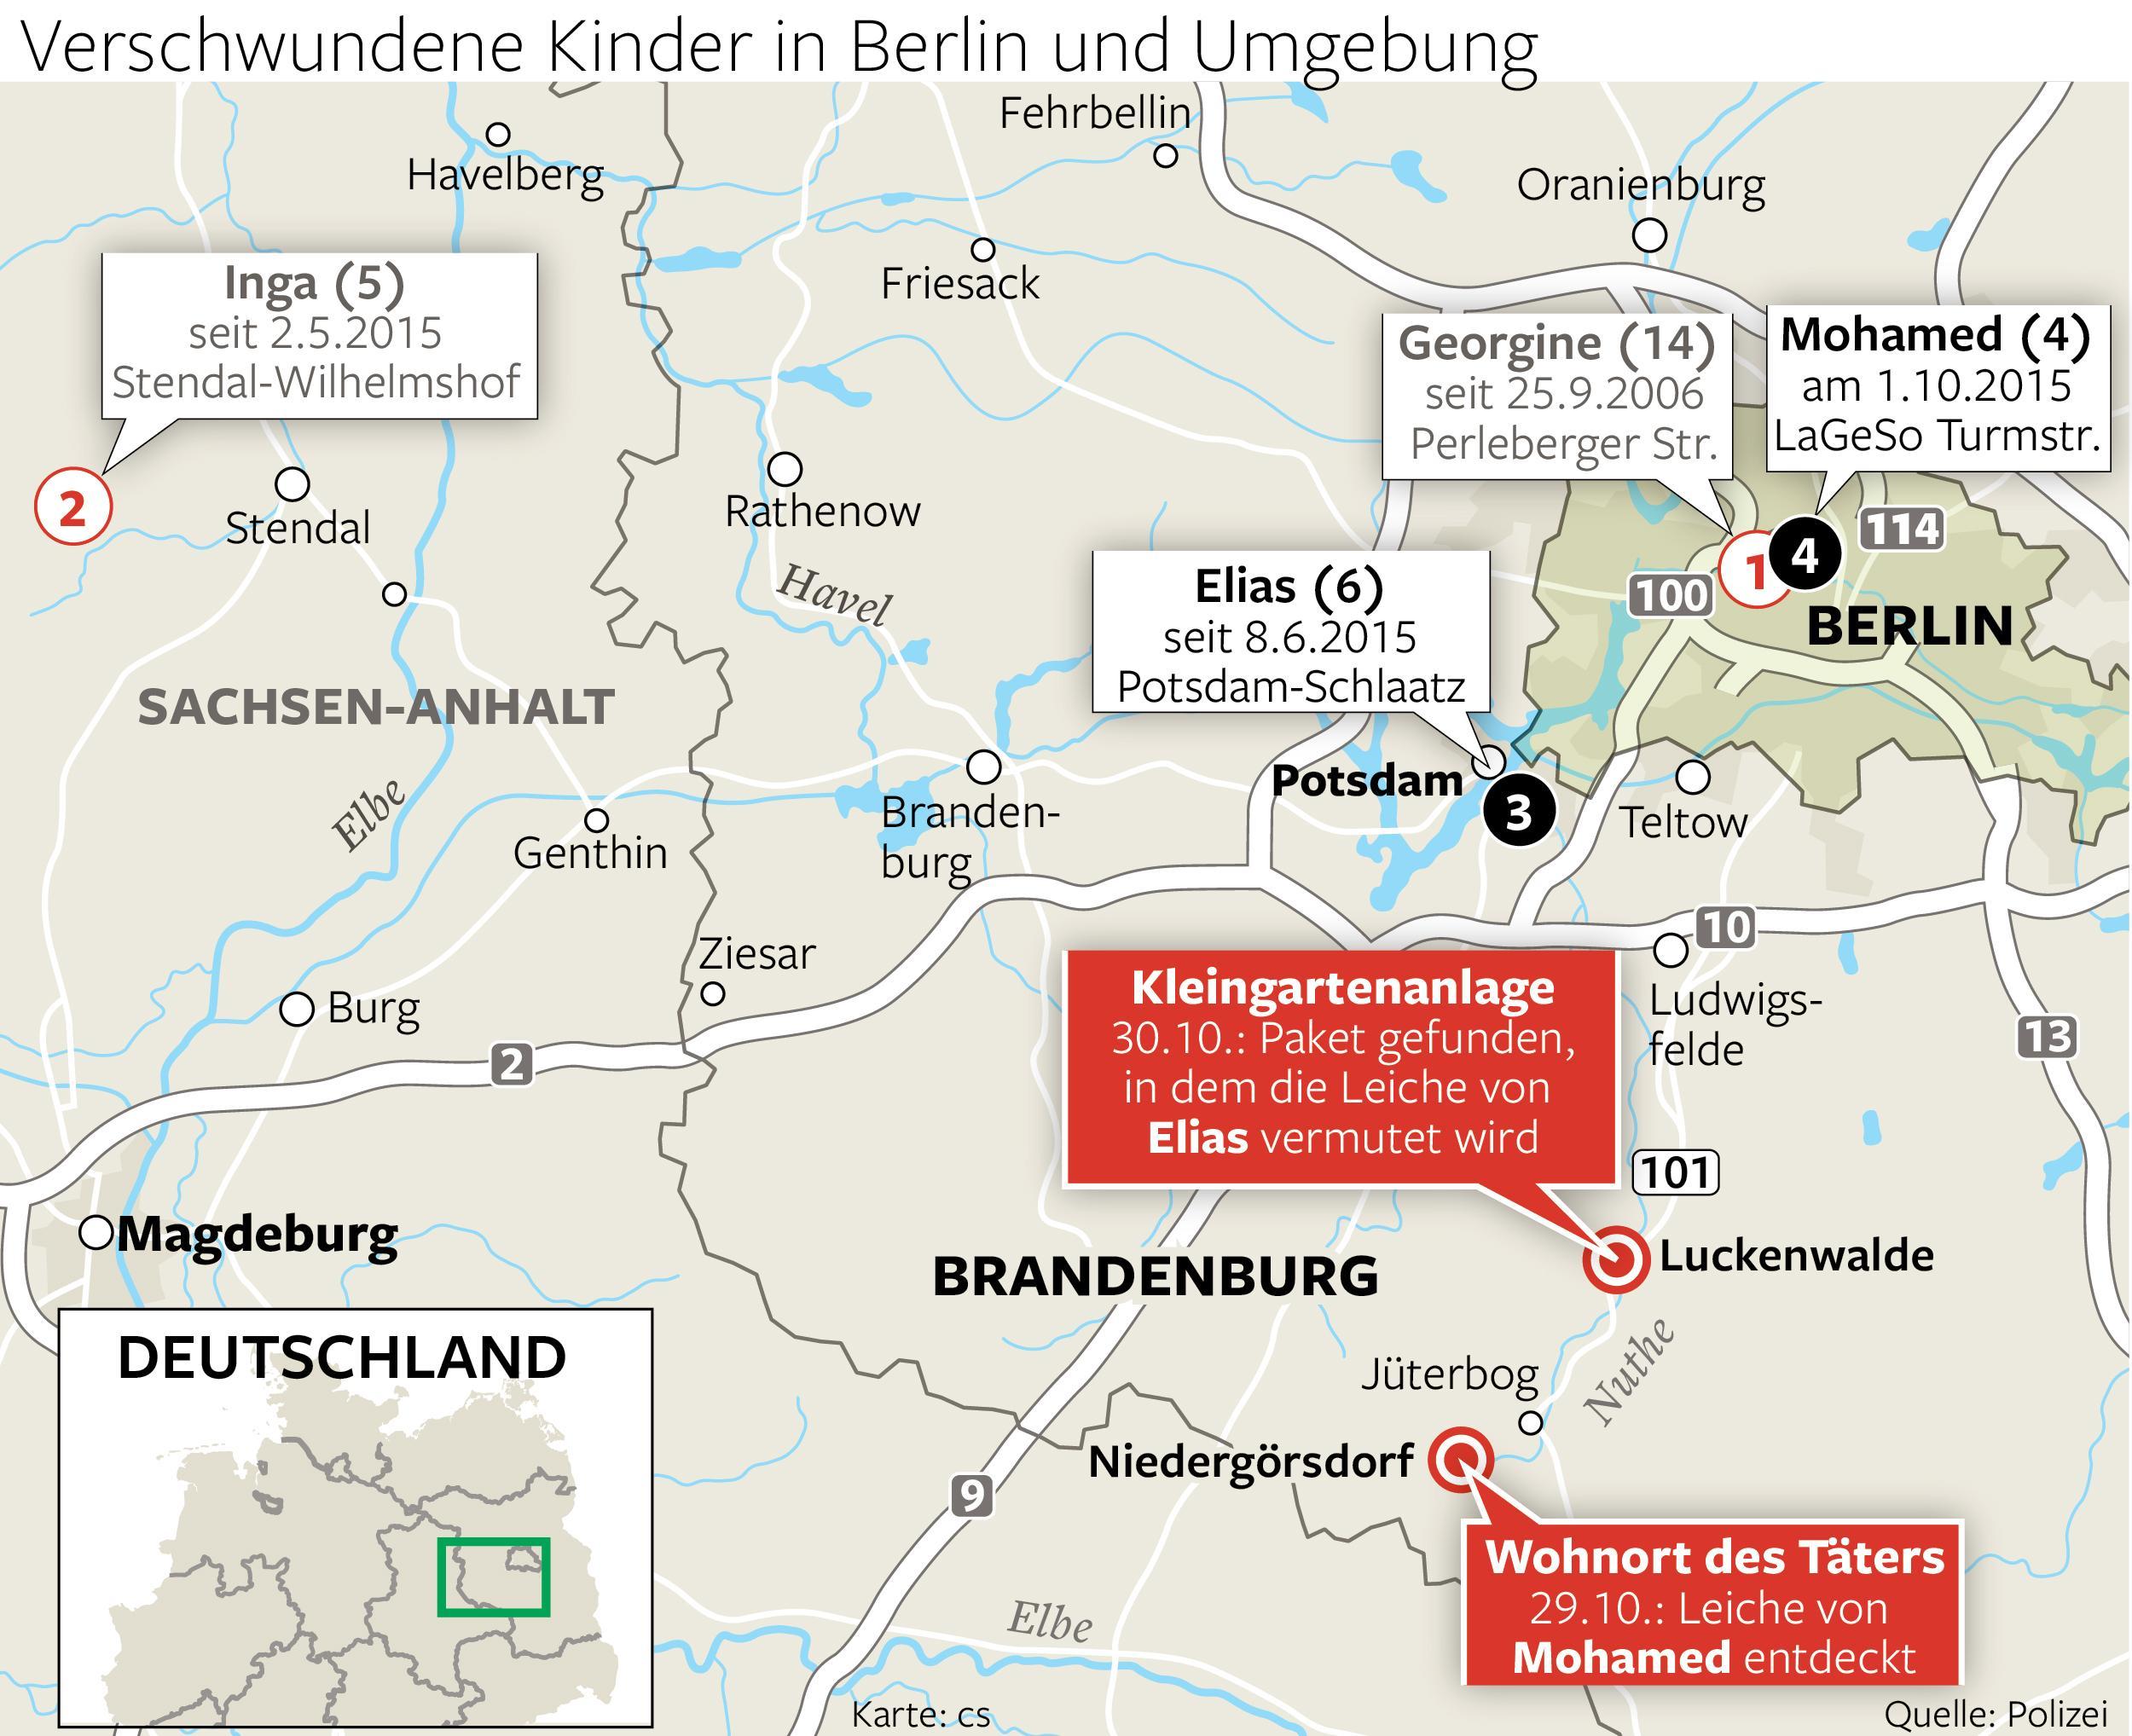 Verschwundene Kinder in Berlin und Umgebung